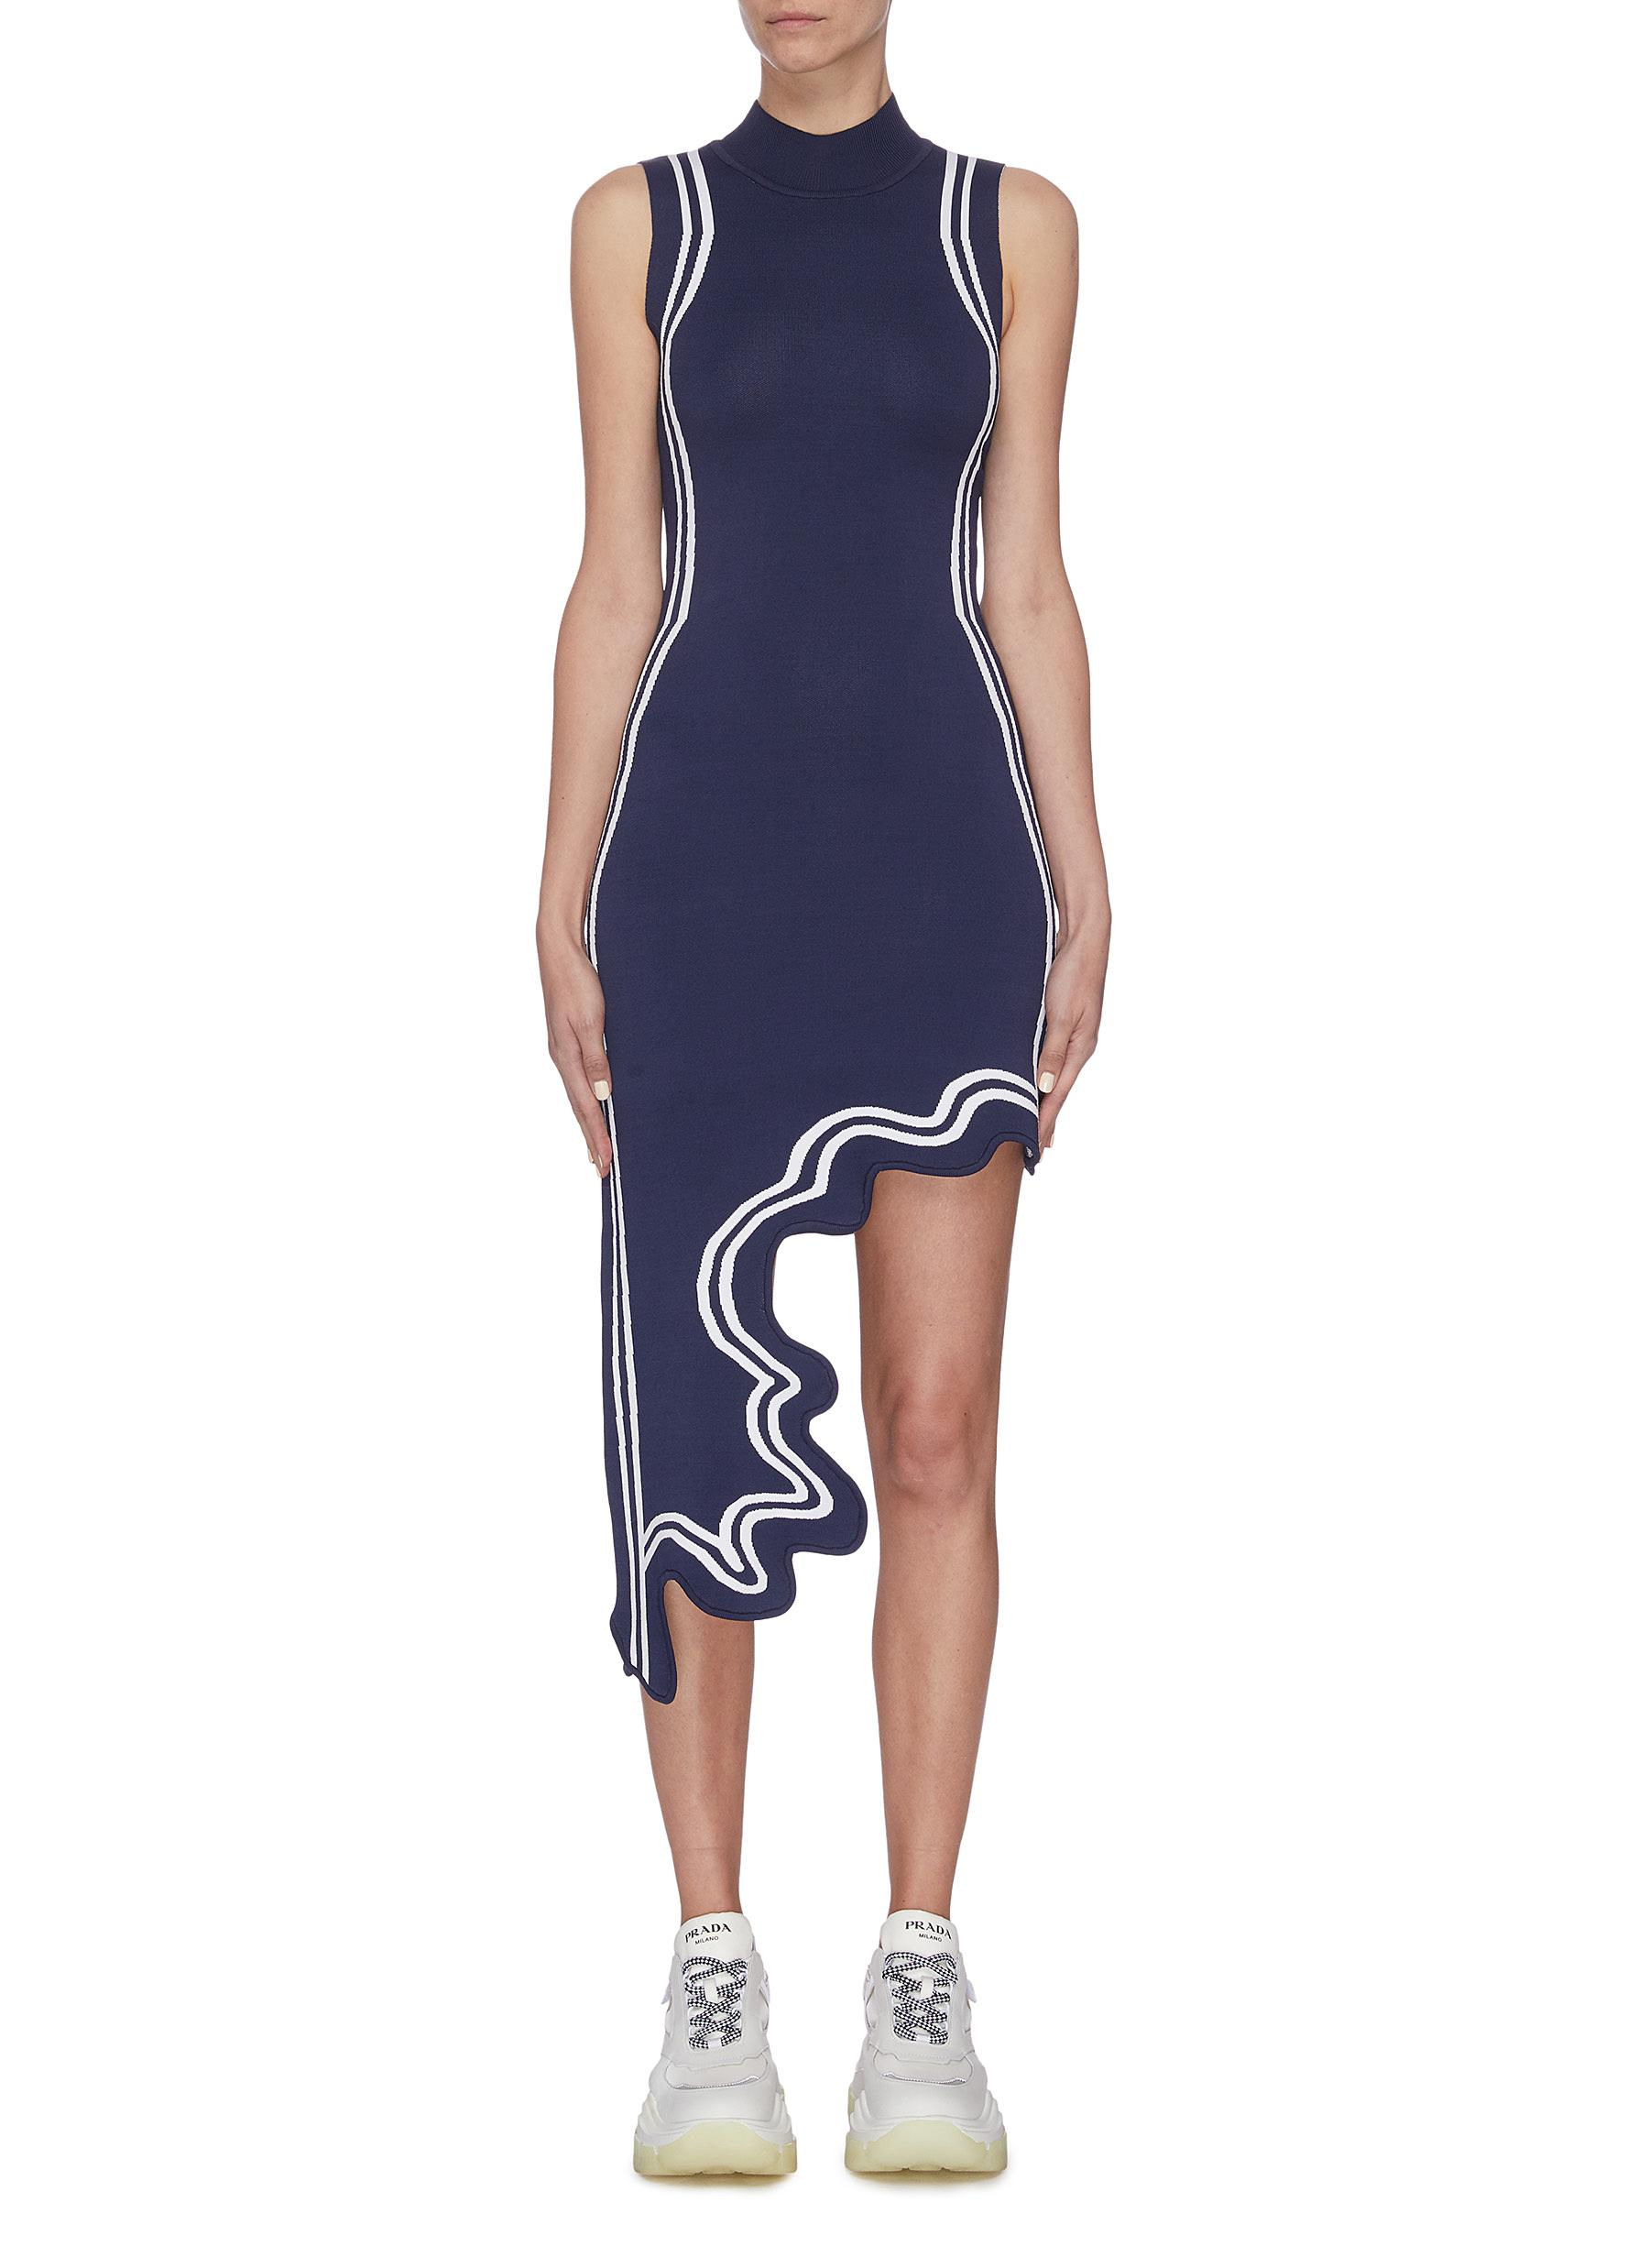 Buy Ph5 Dresses Asymmetric wavy hem high neck sleeveless dress